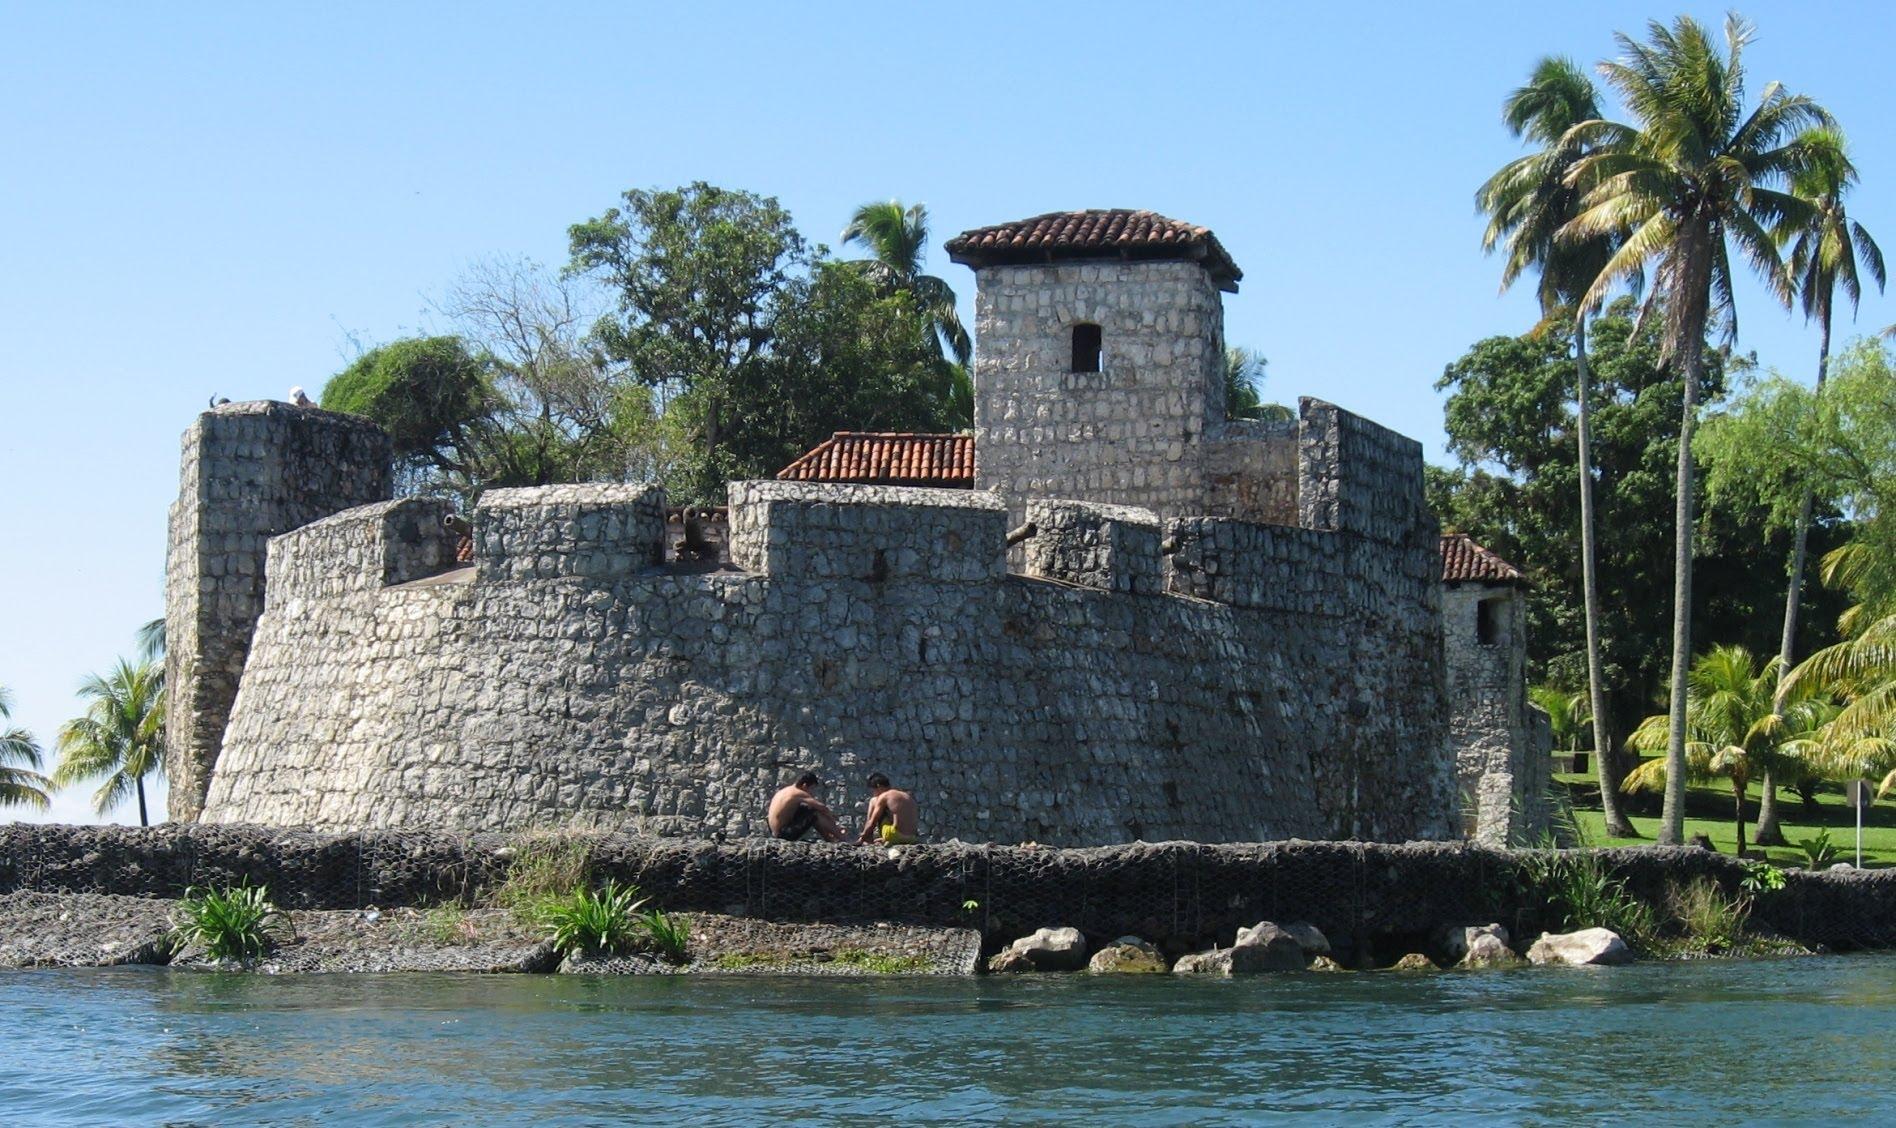 Quatemala, Rio Dulce, San Felipe Castle